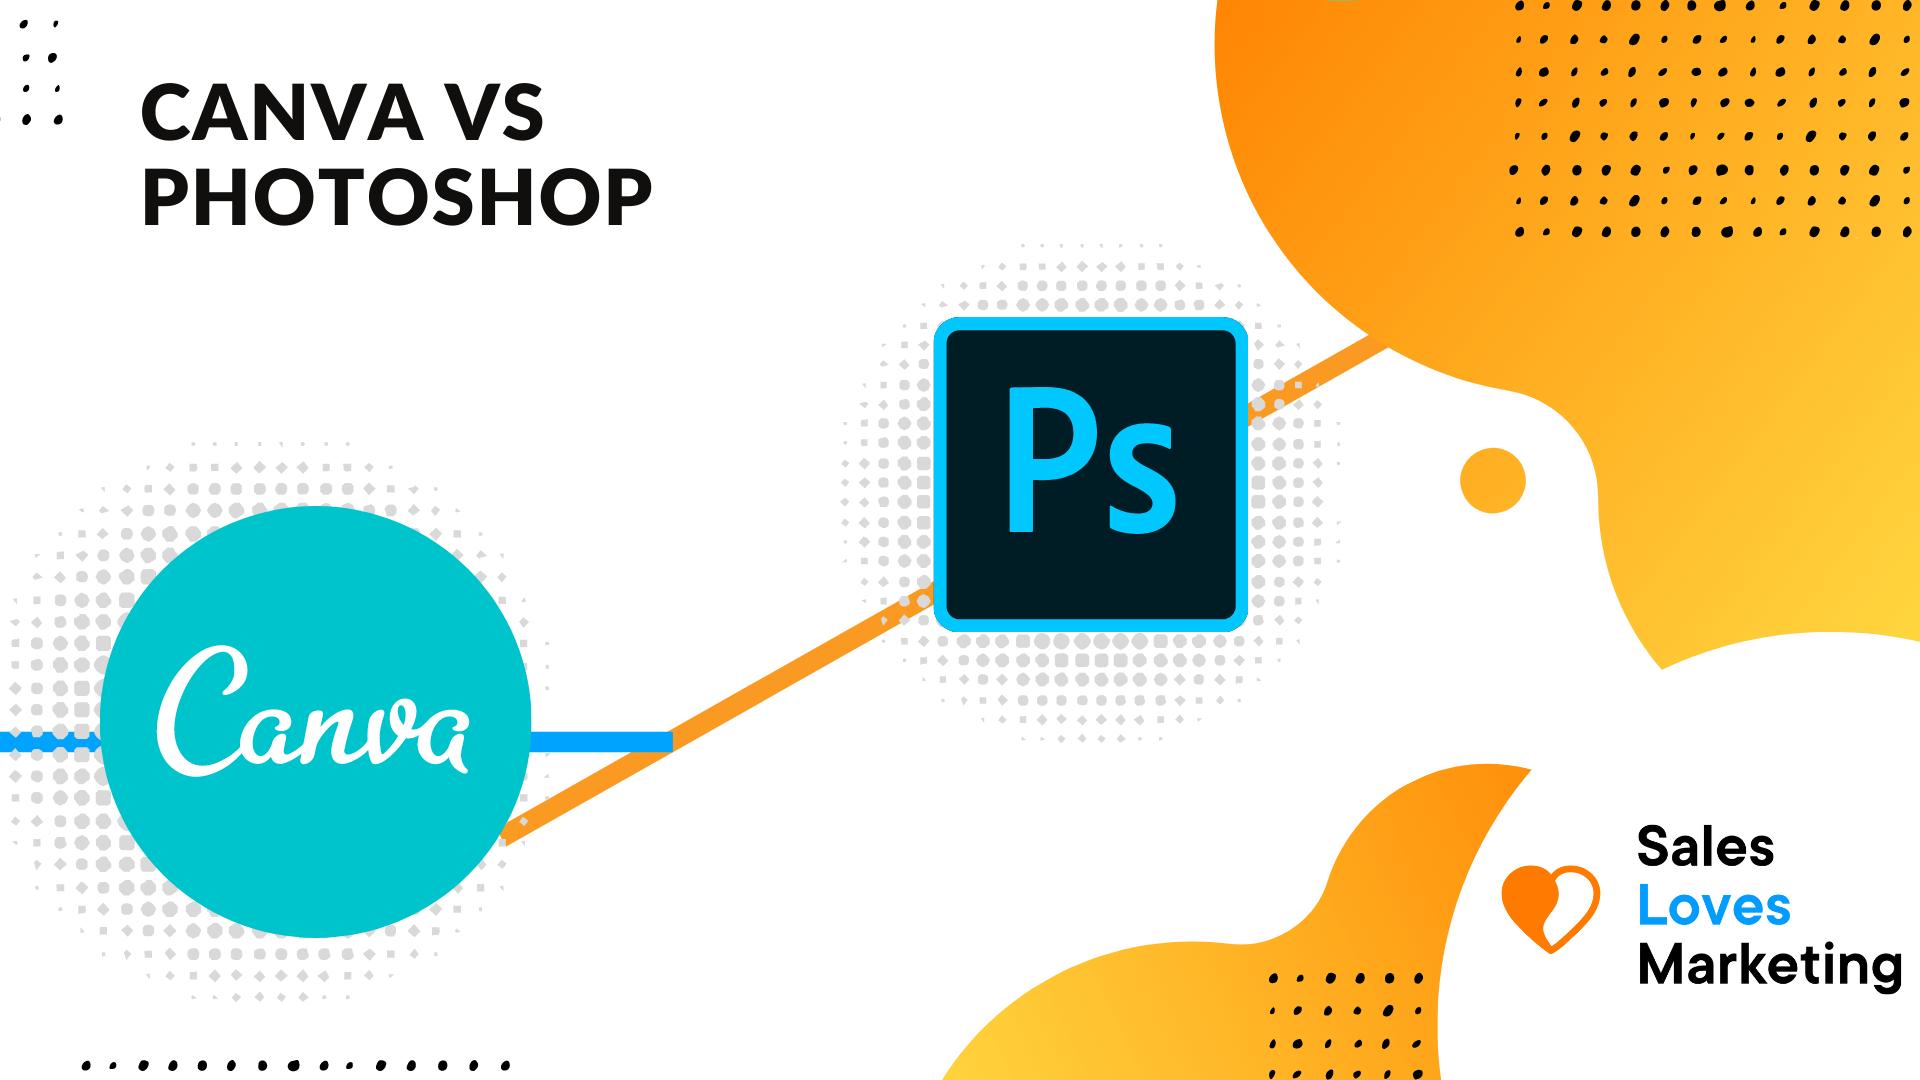 Canva vs Photoshop comparison